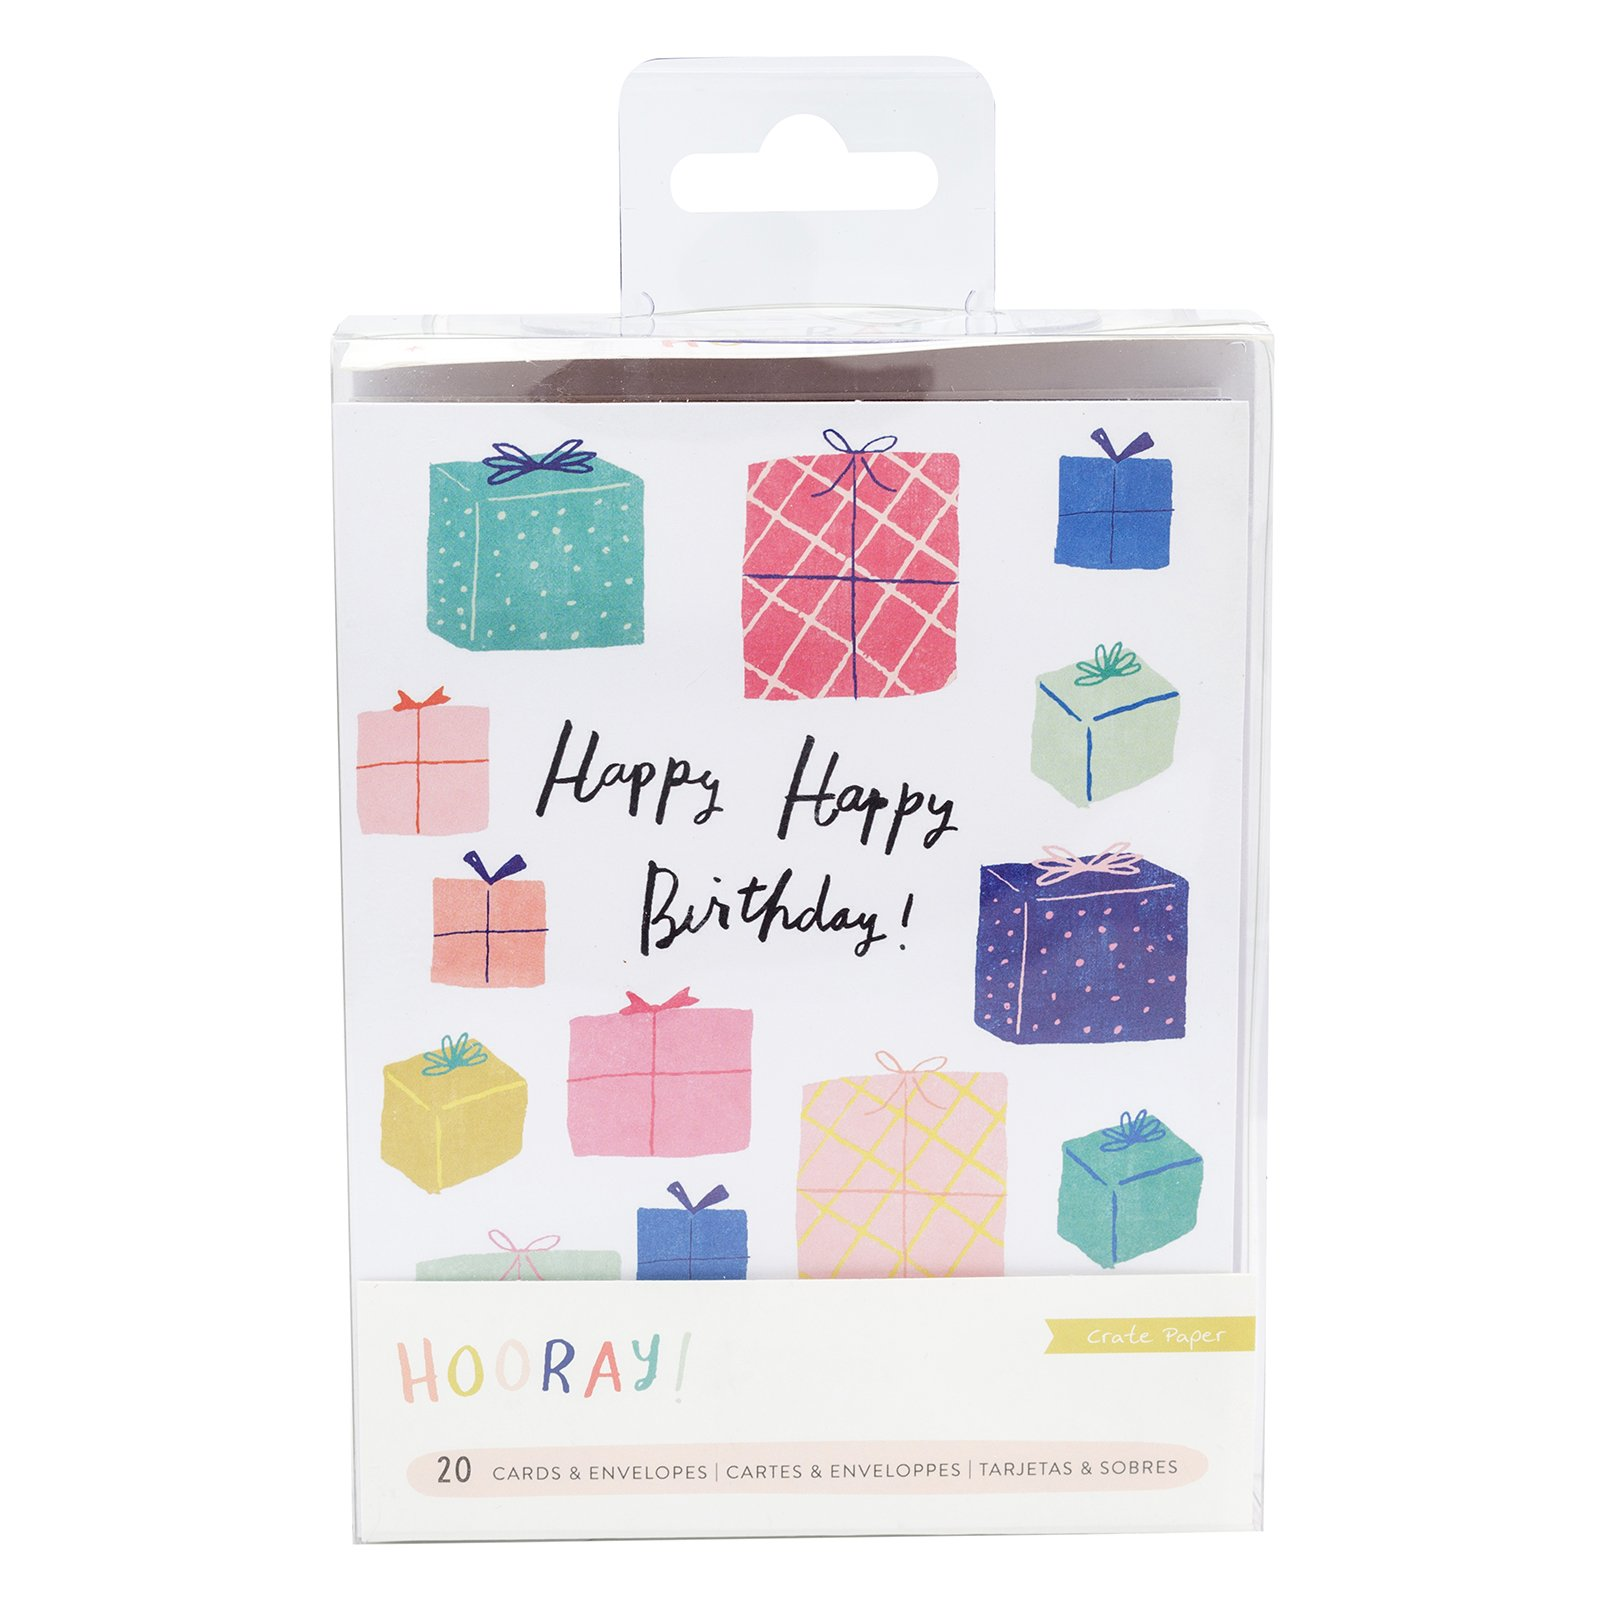 Hooray! Cards & Envelopes